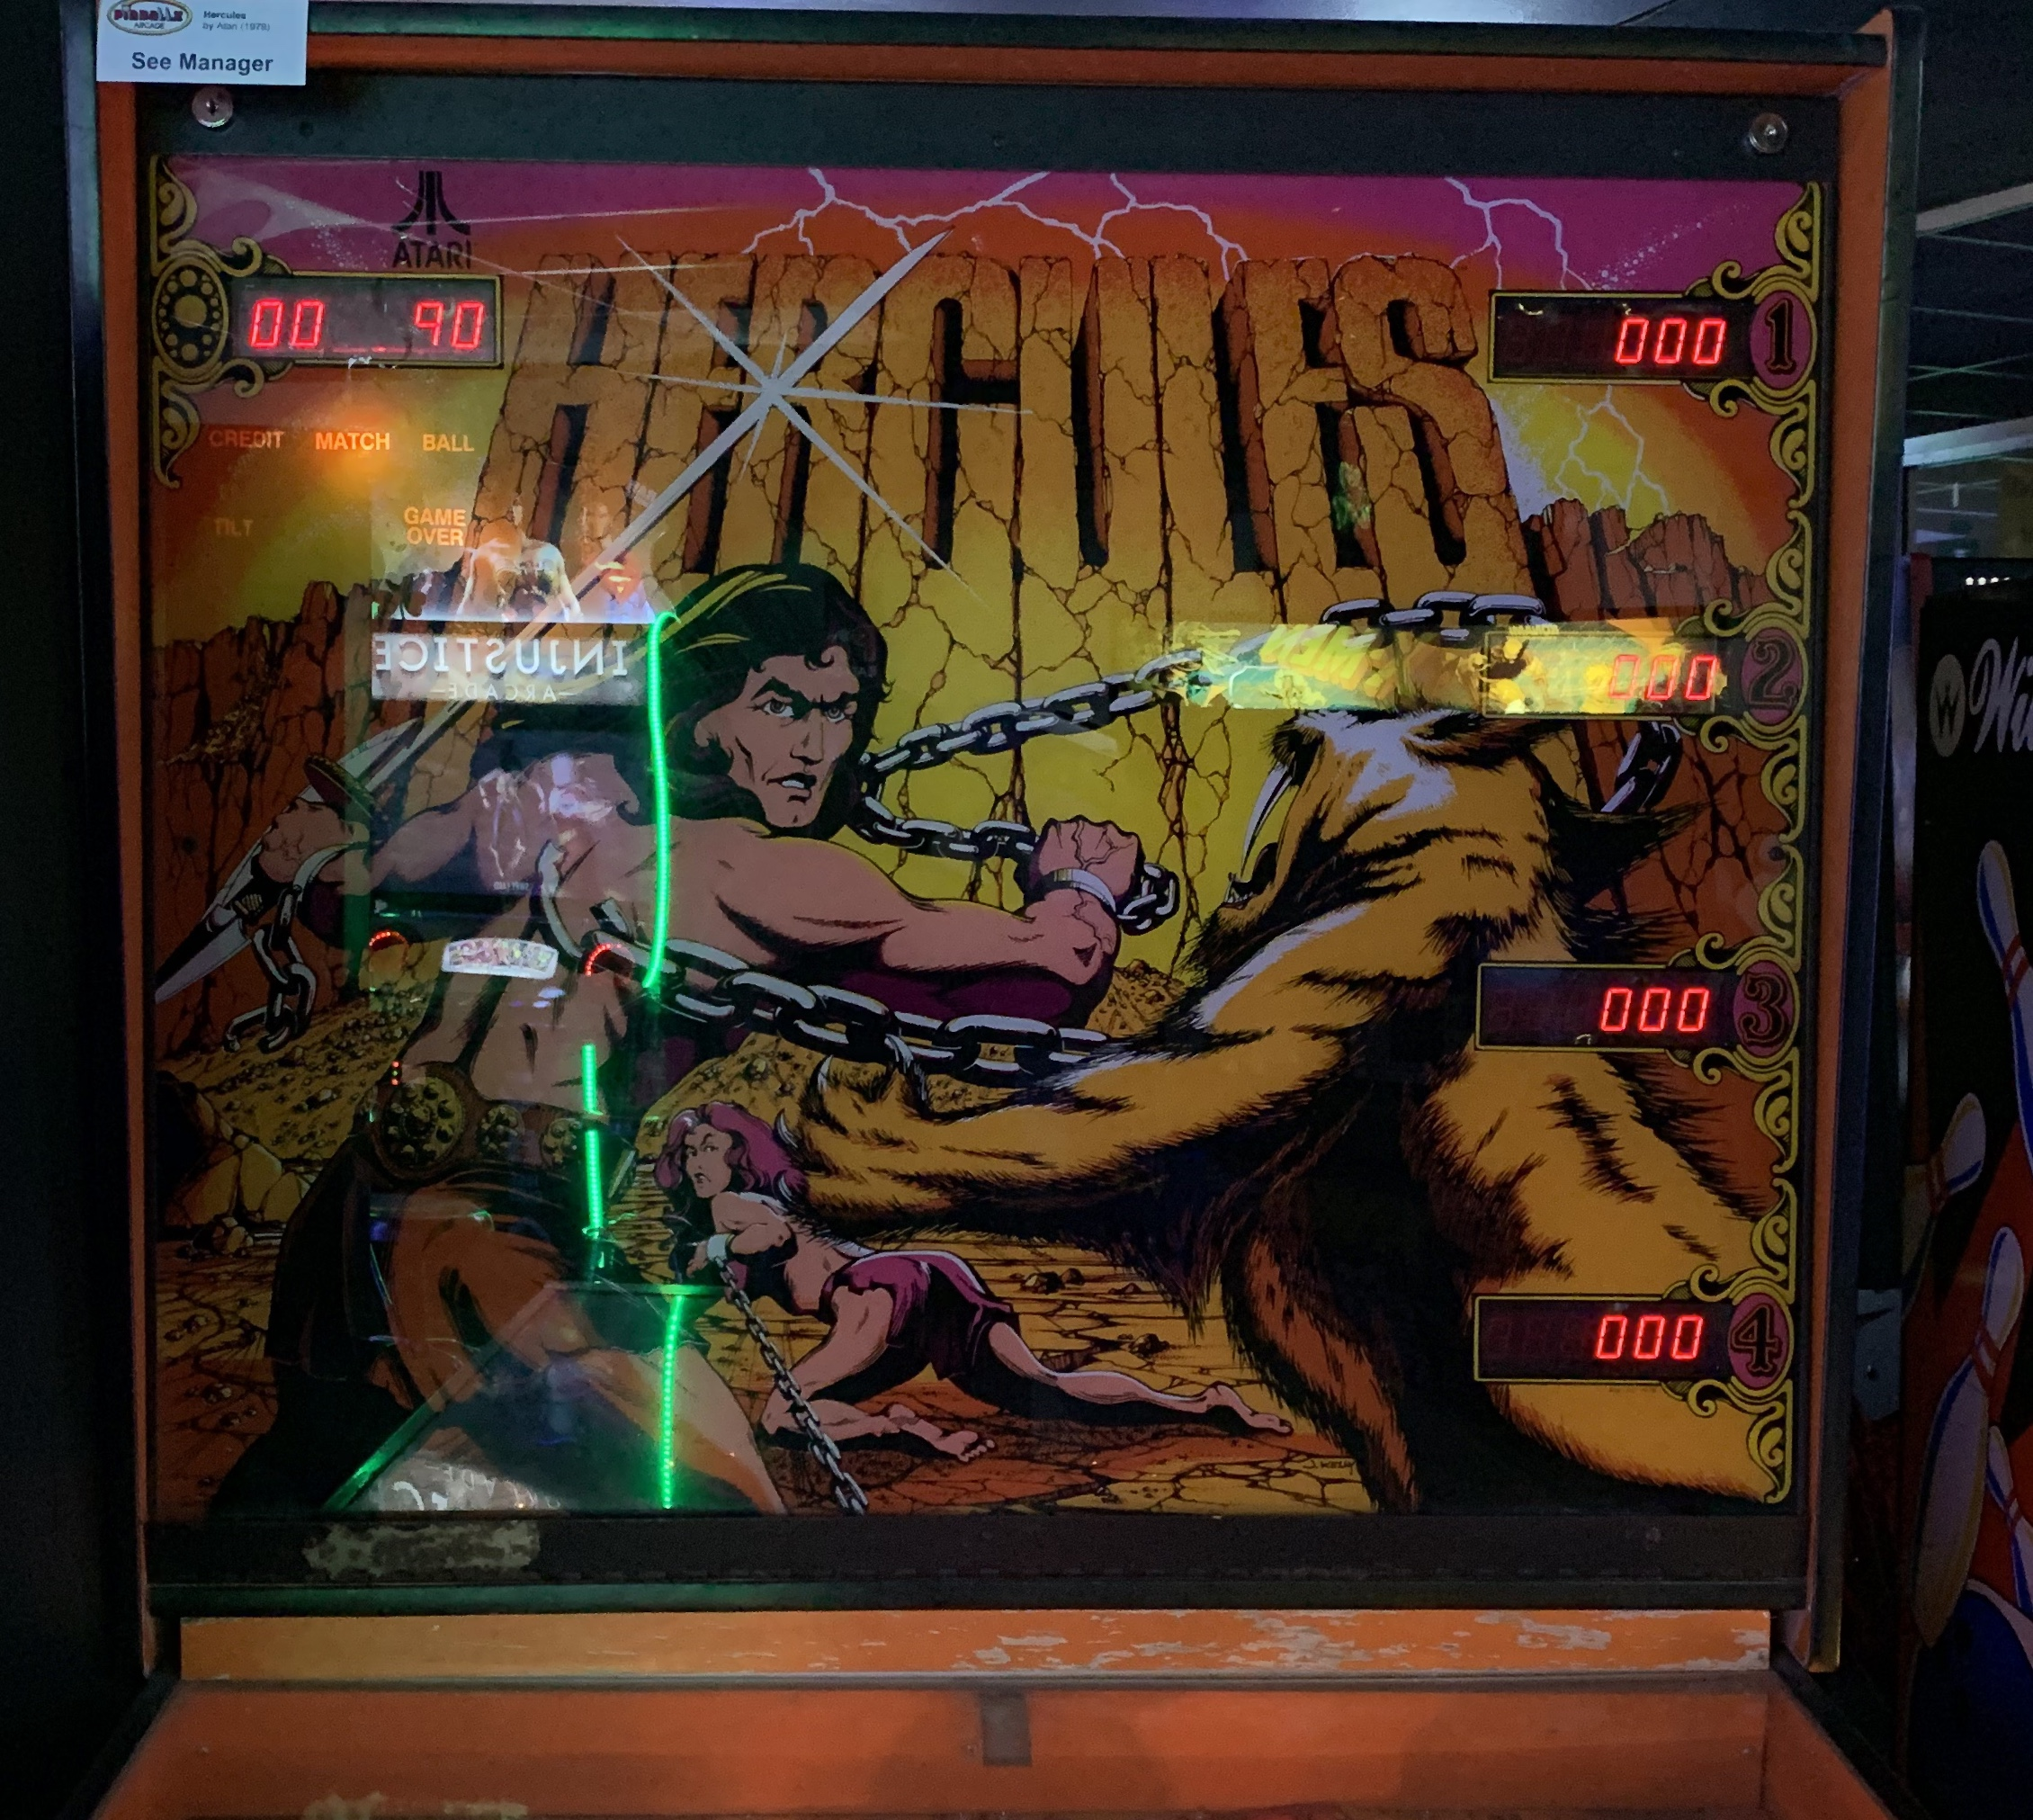 A World of Games: Hercules Pinball